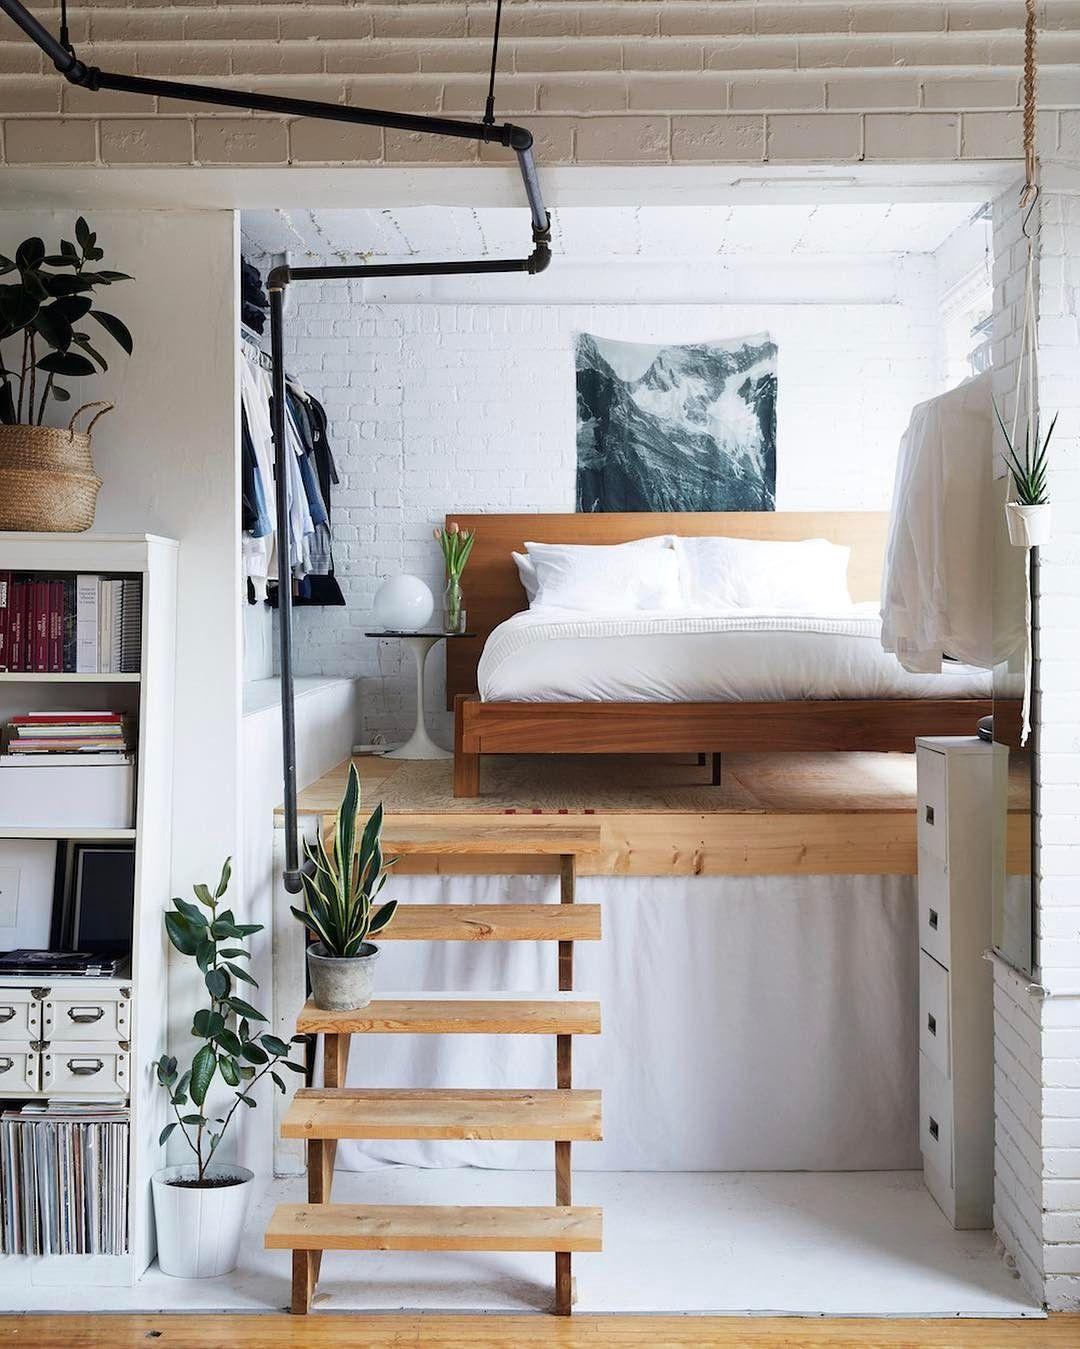 2 bedroom loft  Pin by Allison Venning on h o m e u s t u d i o  Pinterest  Bed